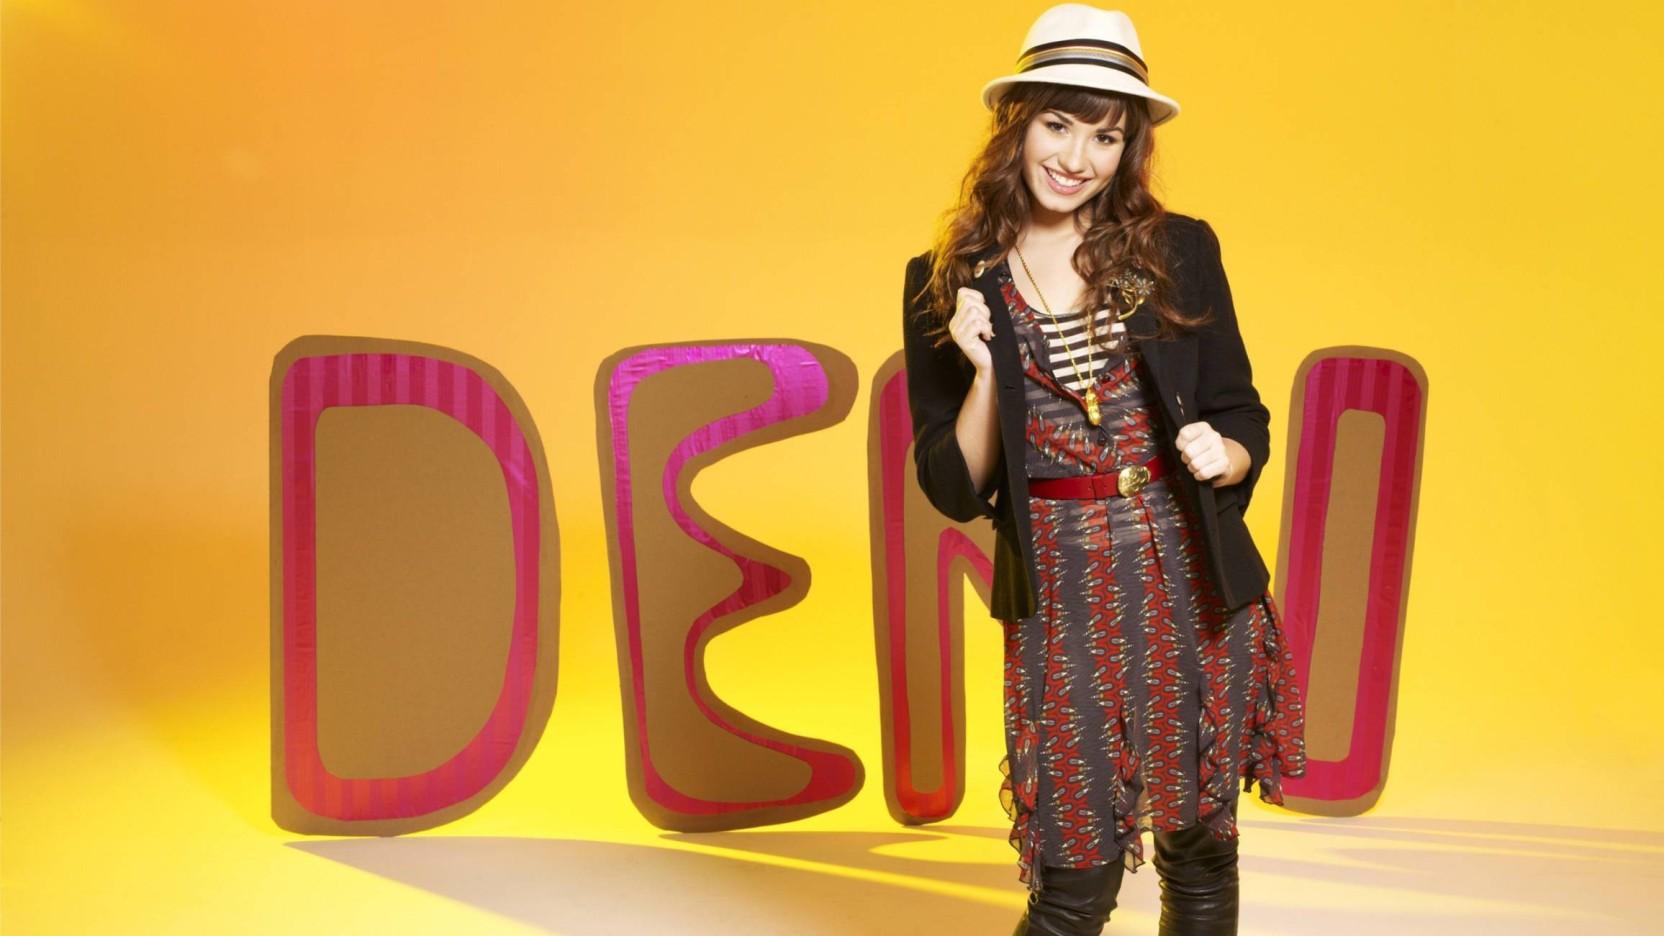 Beautiful Demi Lovato Wall Art Composition - Wall Art Ideas ...